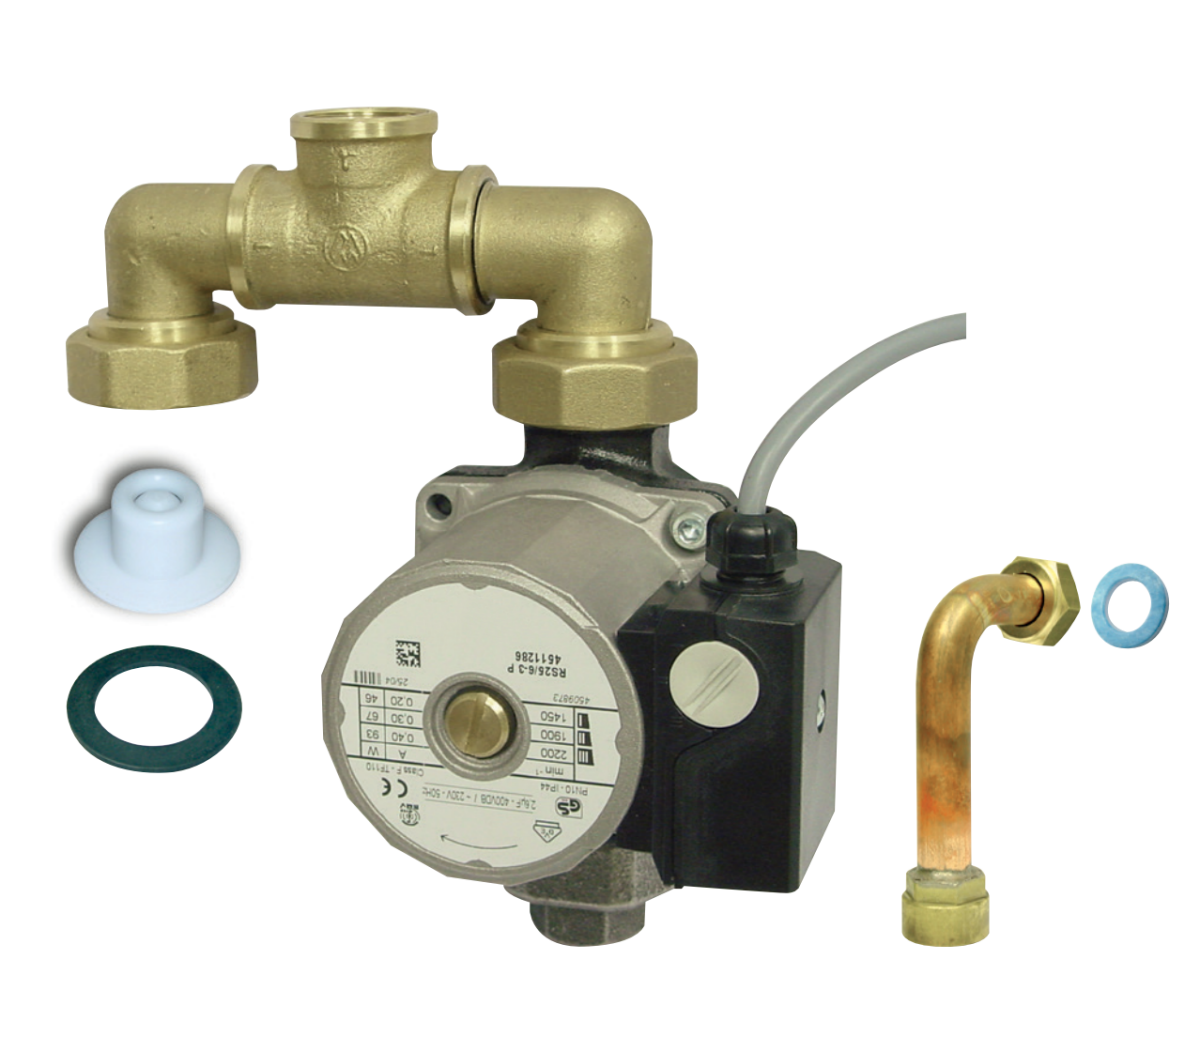 Kit Sanitair in combinatie met externe boiler